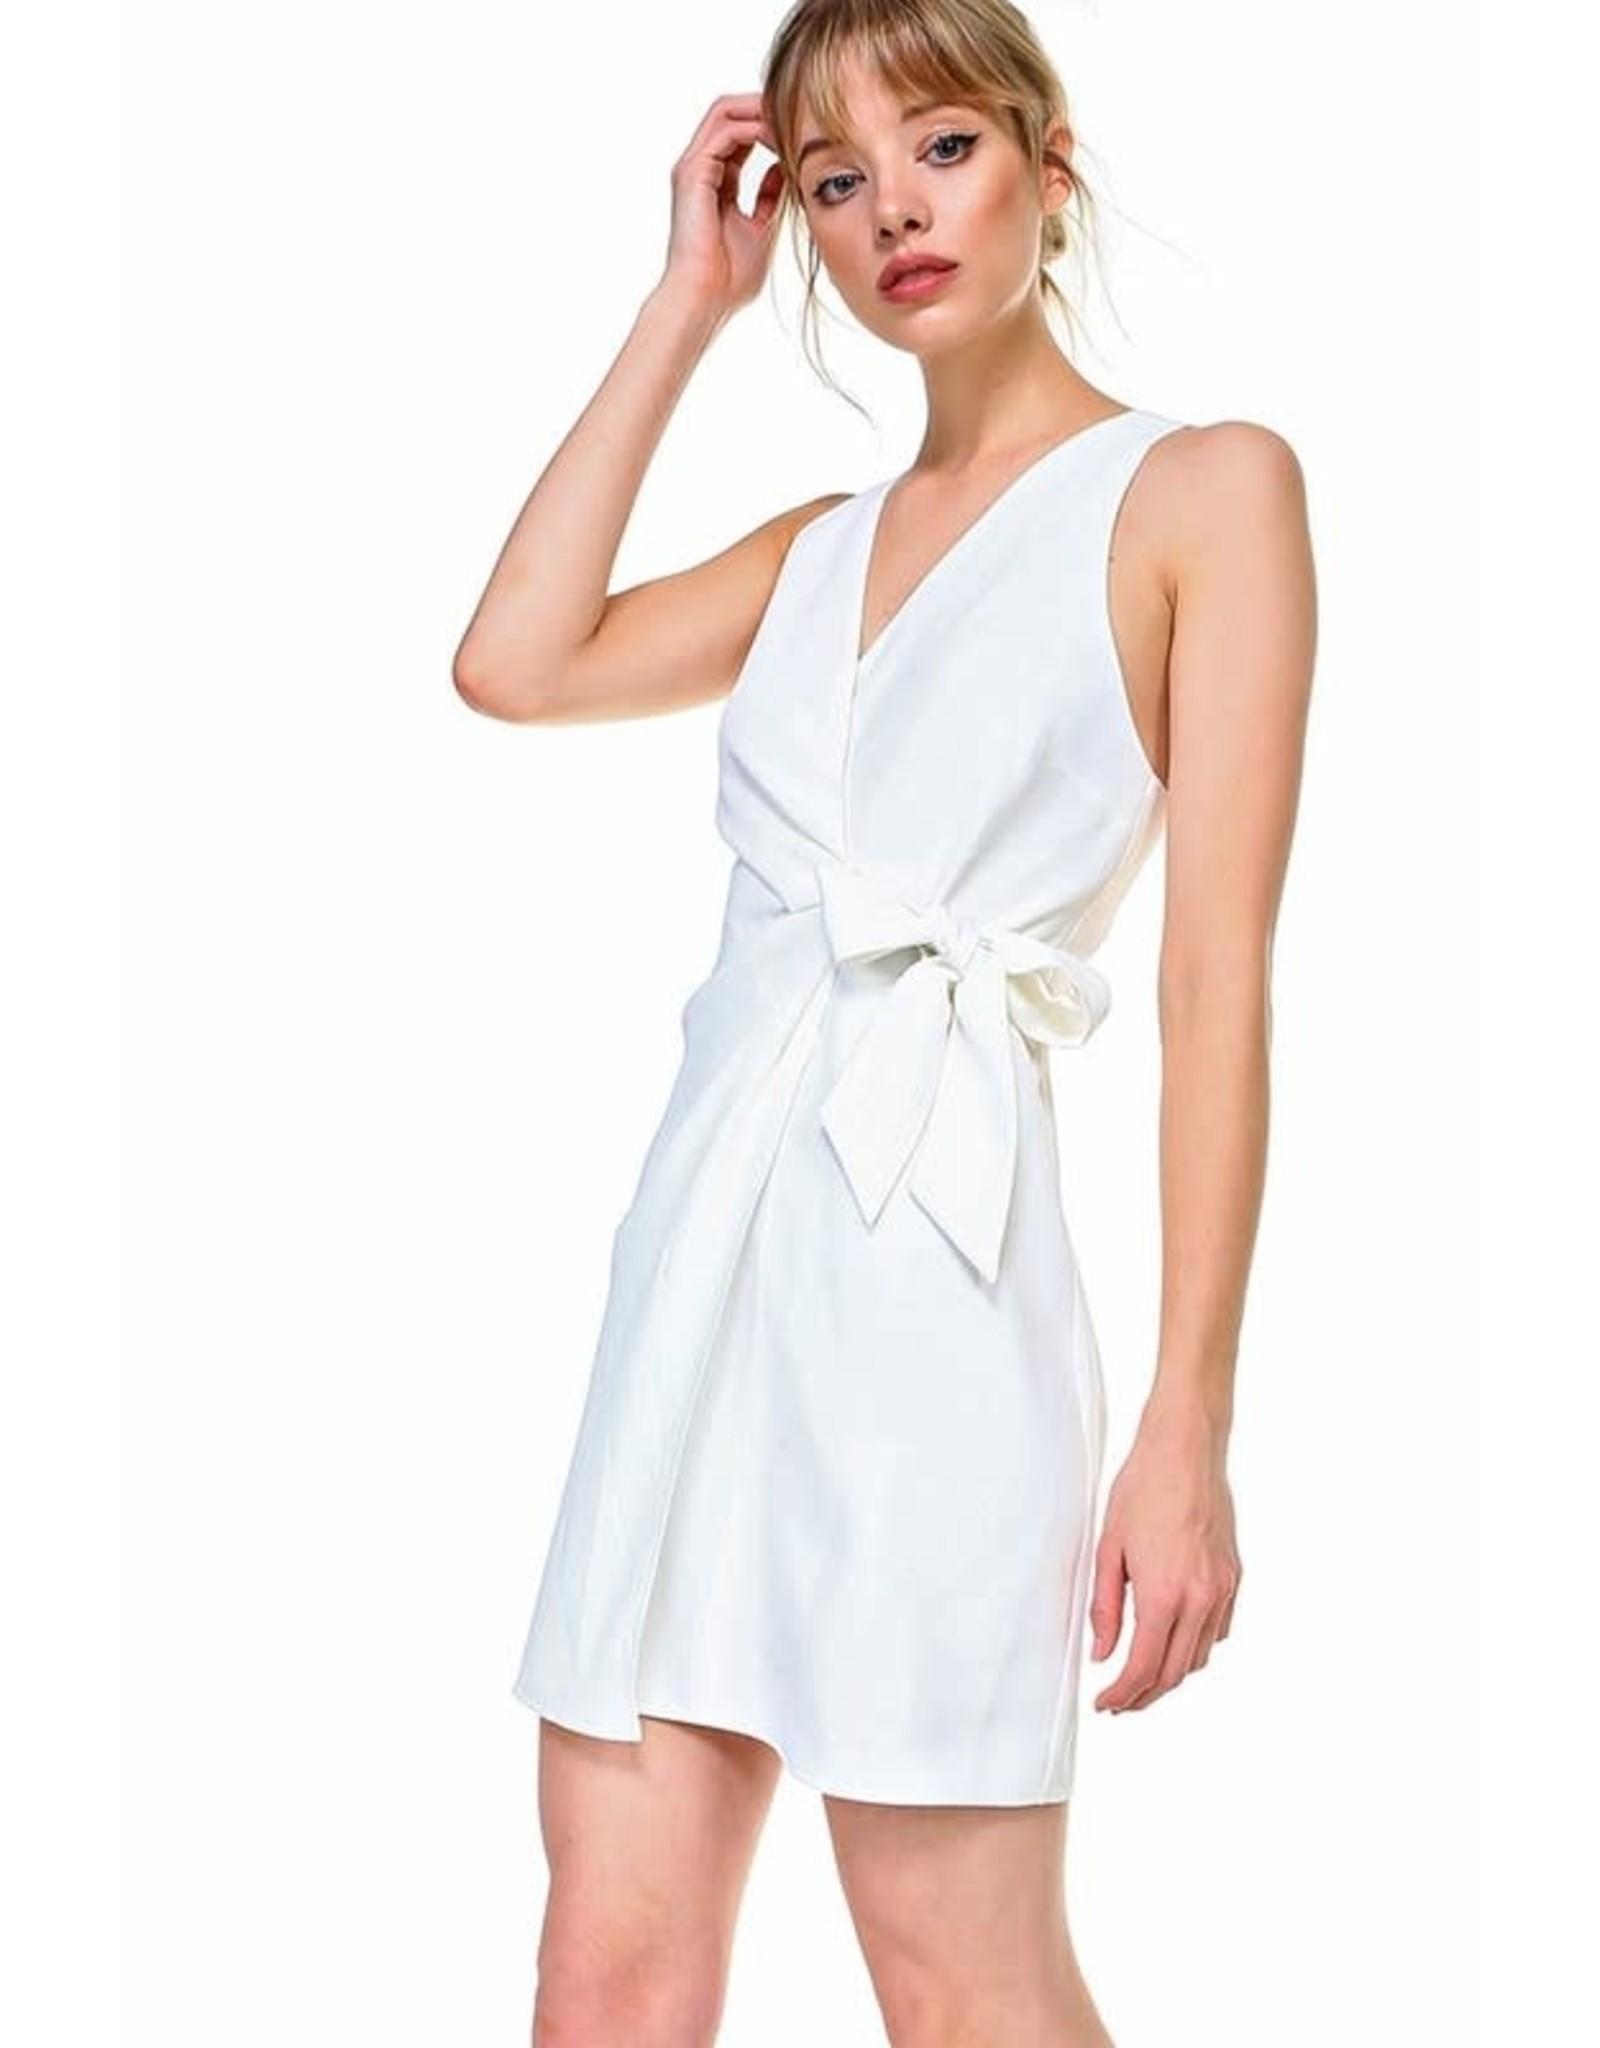 White Tie Affair Dress